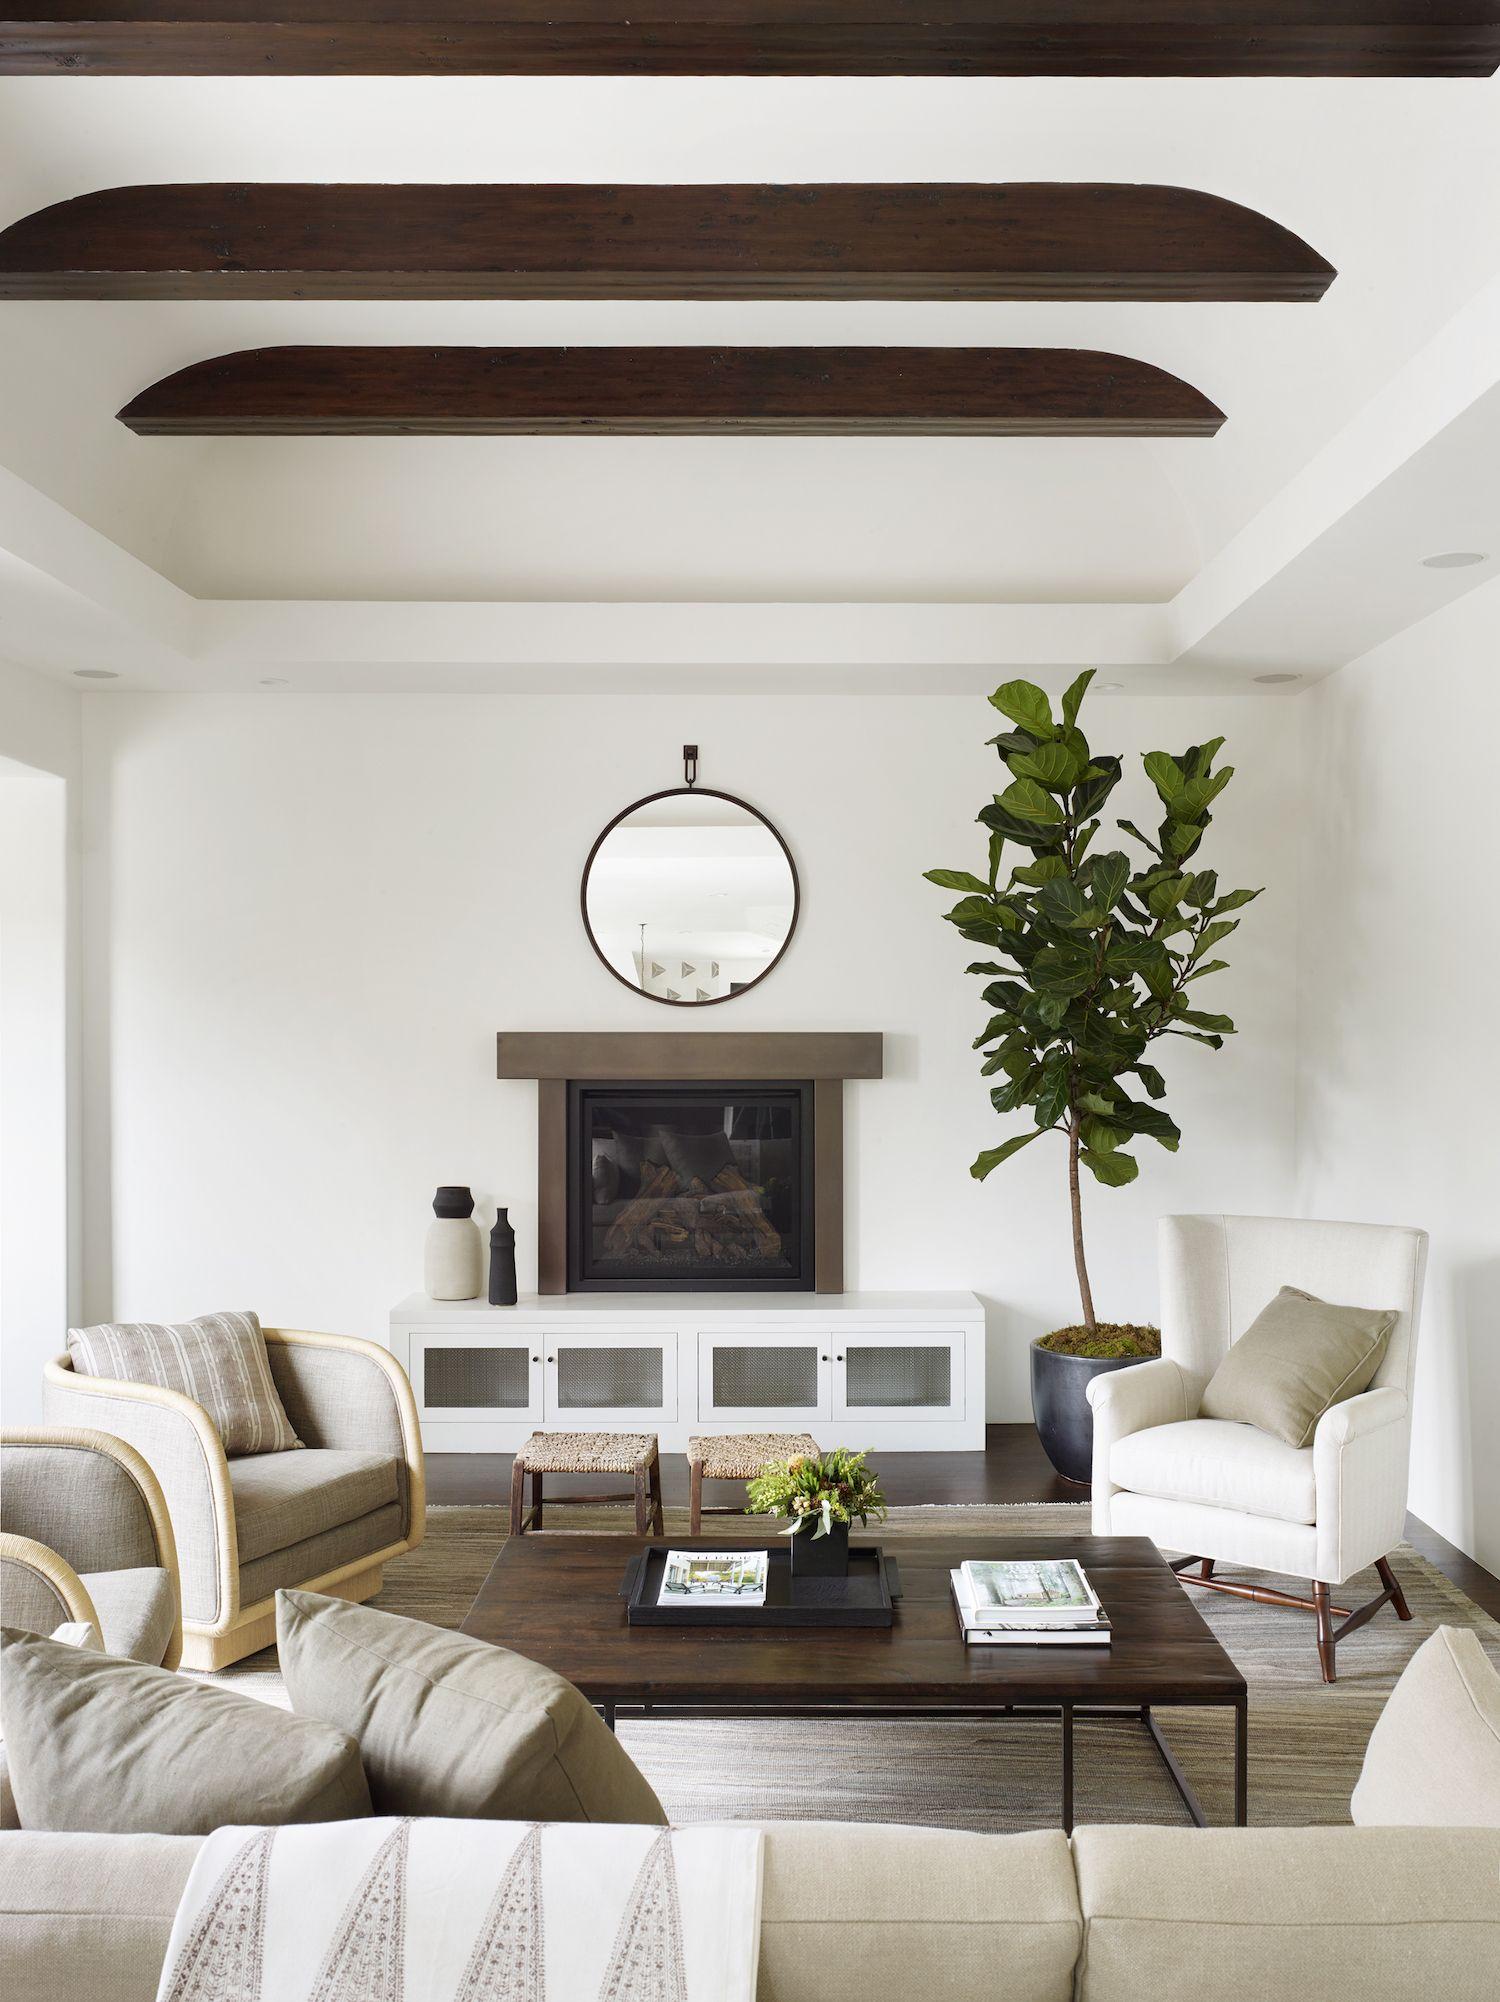 Merveilleux Natural Materials 101 By Alison Davin Of Jute Interior Design | Rue